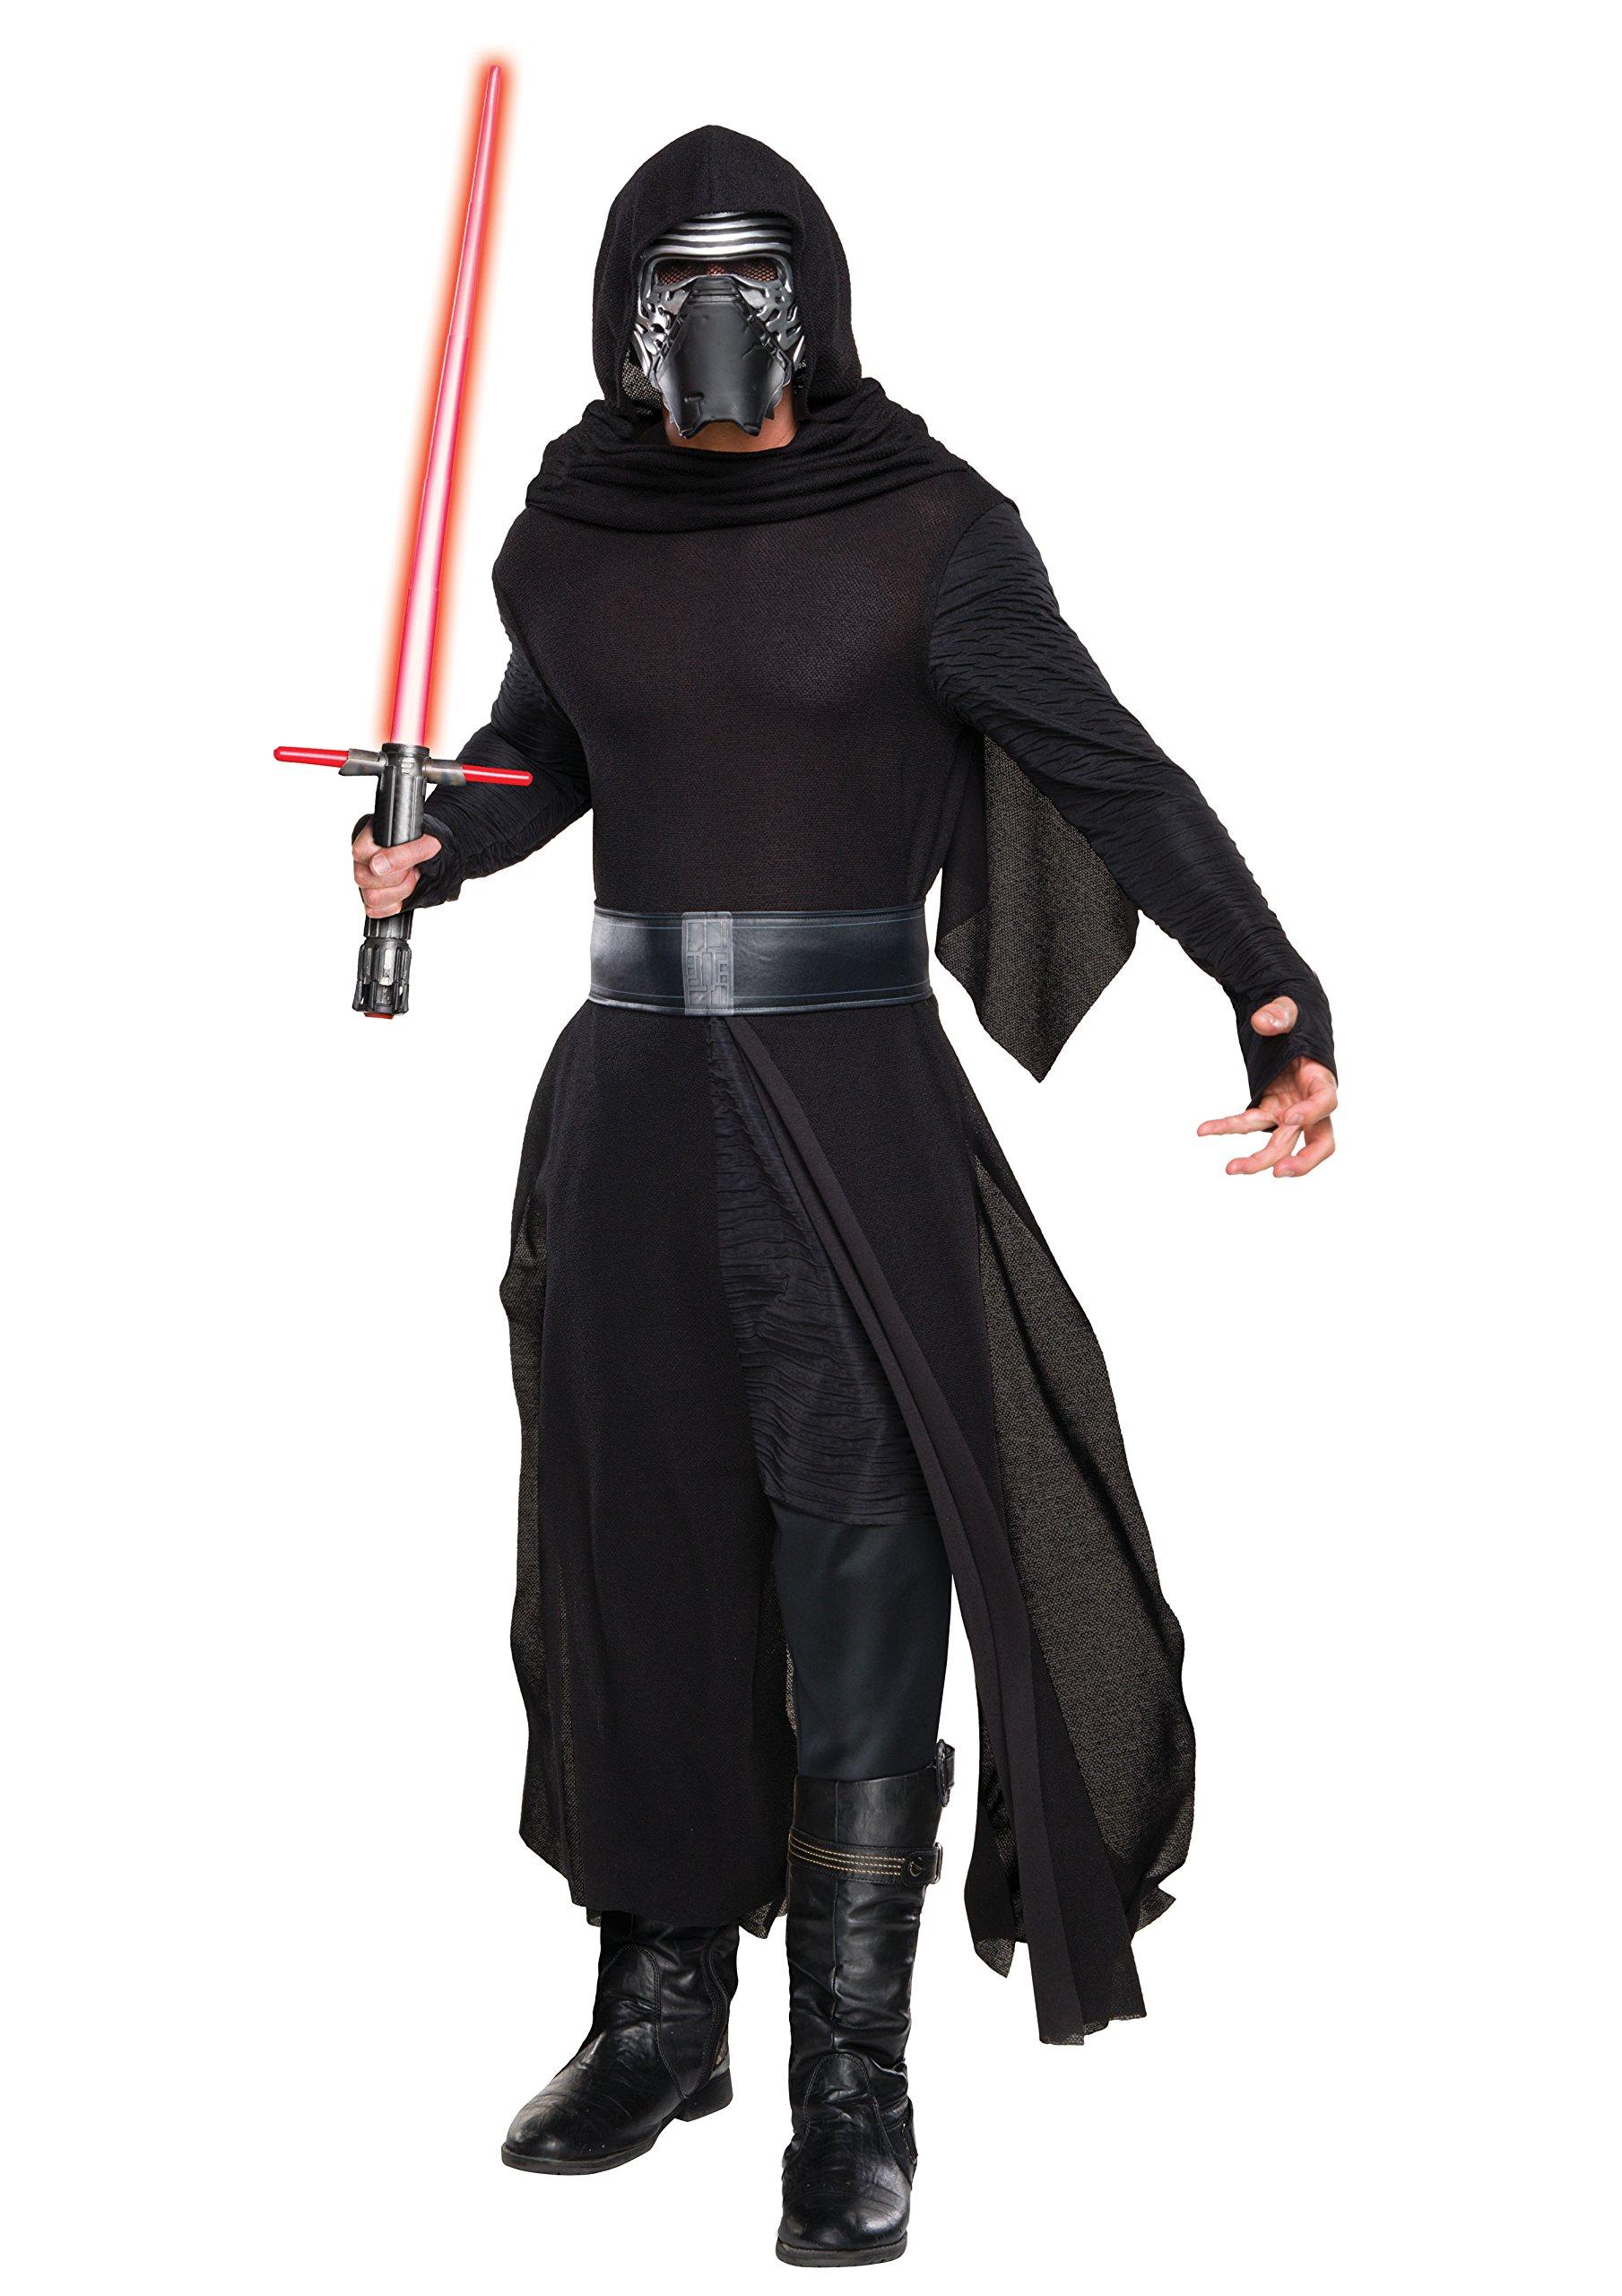 Star Wars: The Force Awakens Deluxe Adult Kylo Ren Costume,Multi,Standard